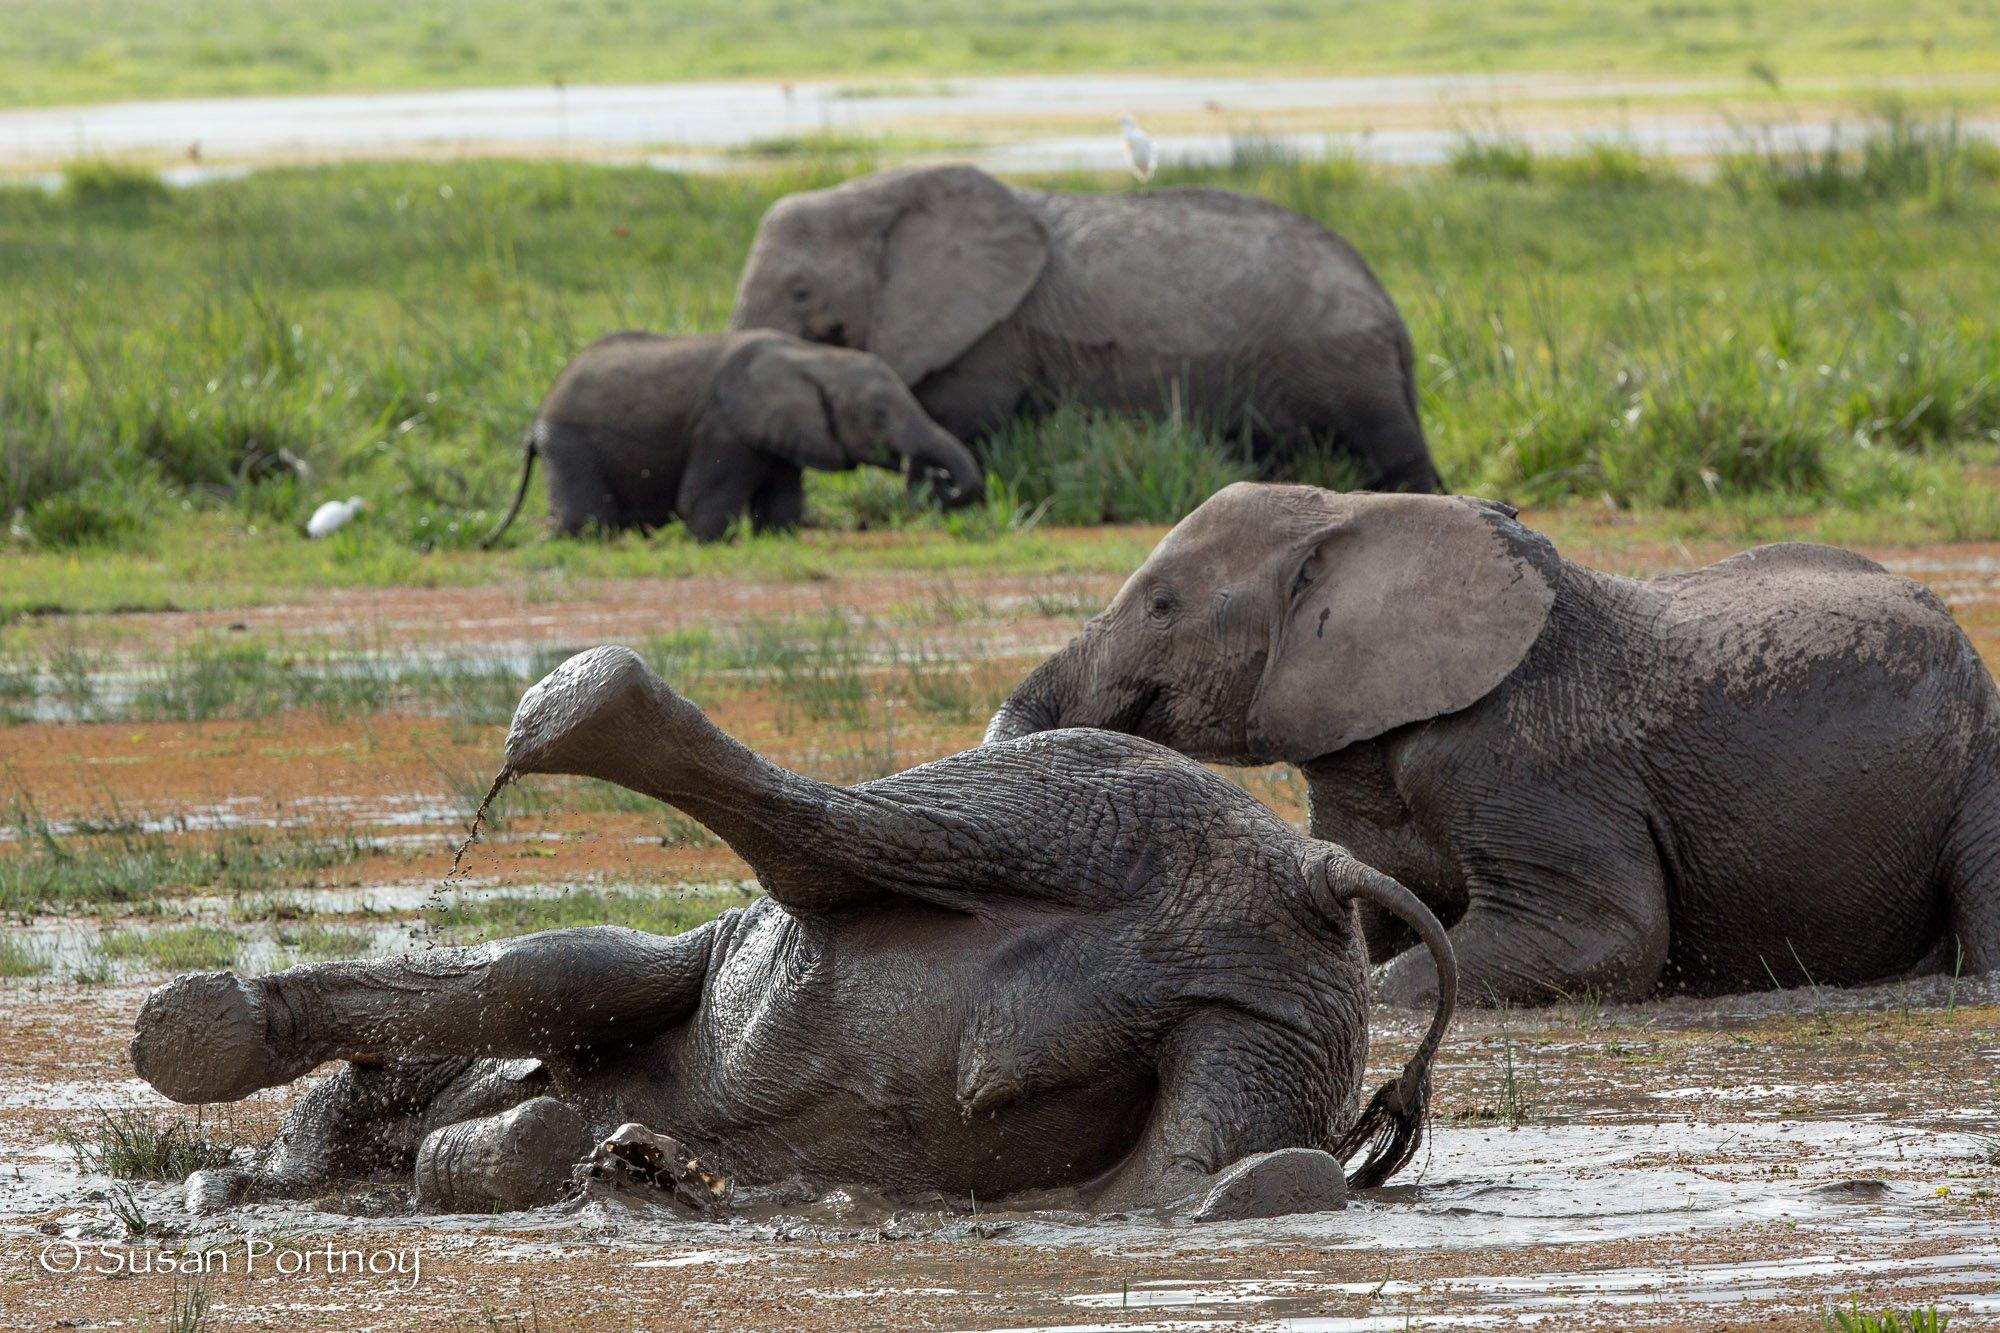 Elephant rolls in the mud in Amboseli, Kenya